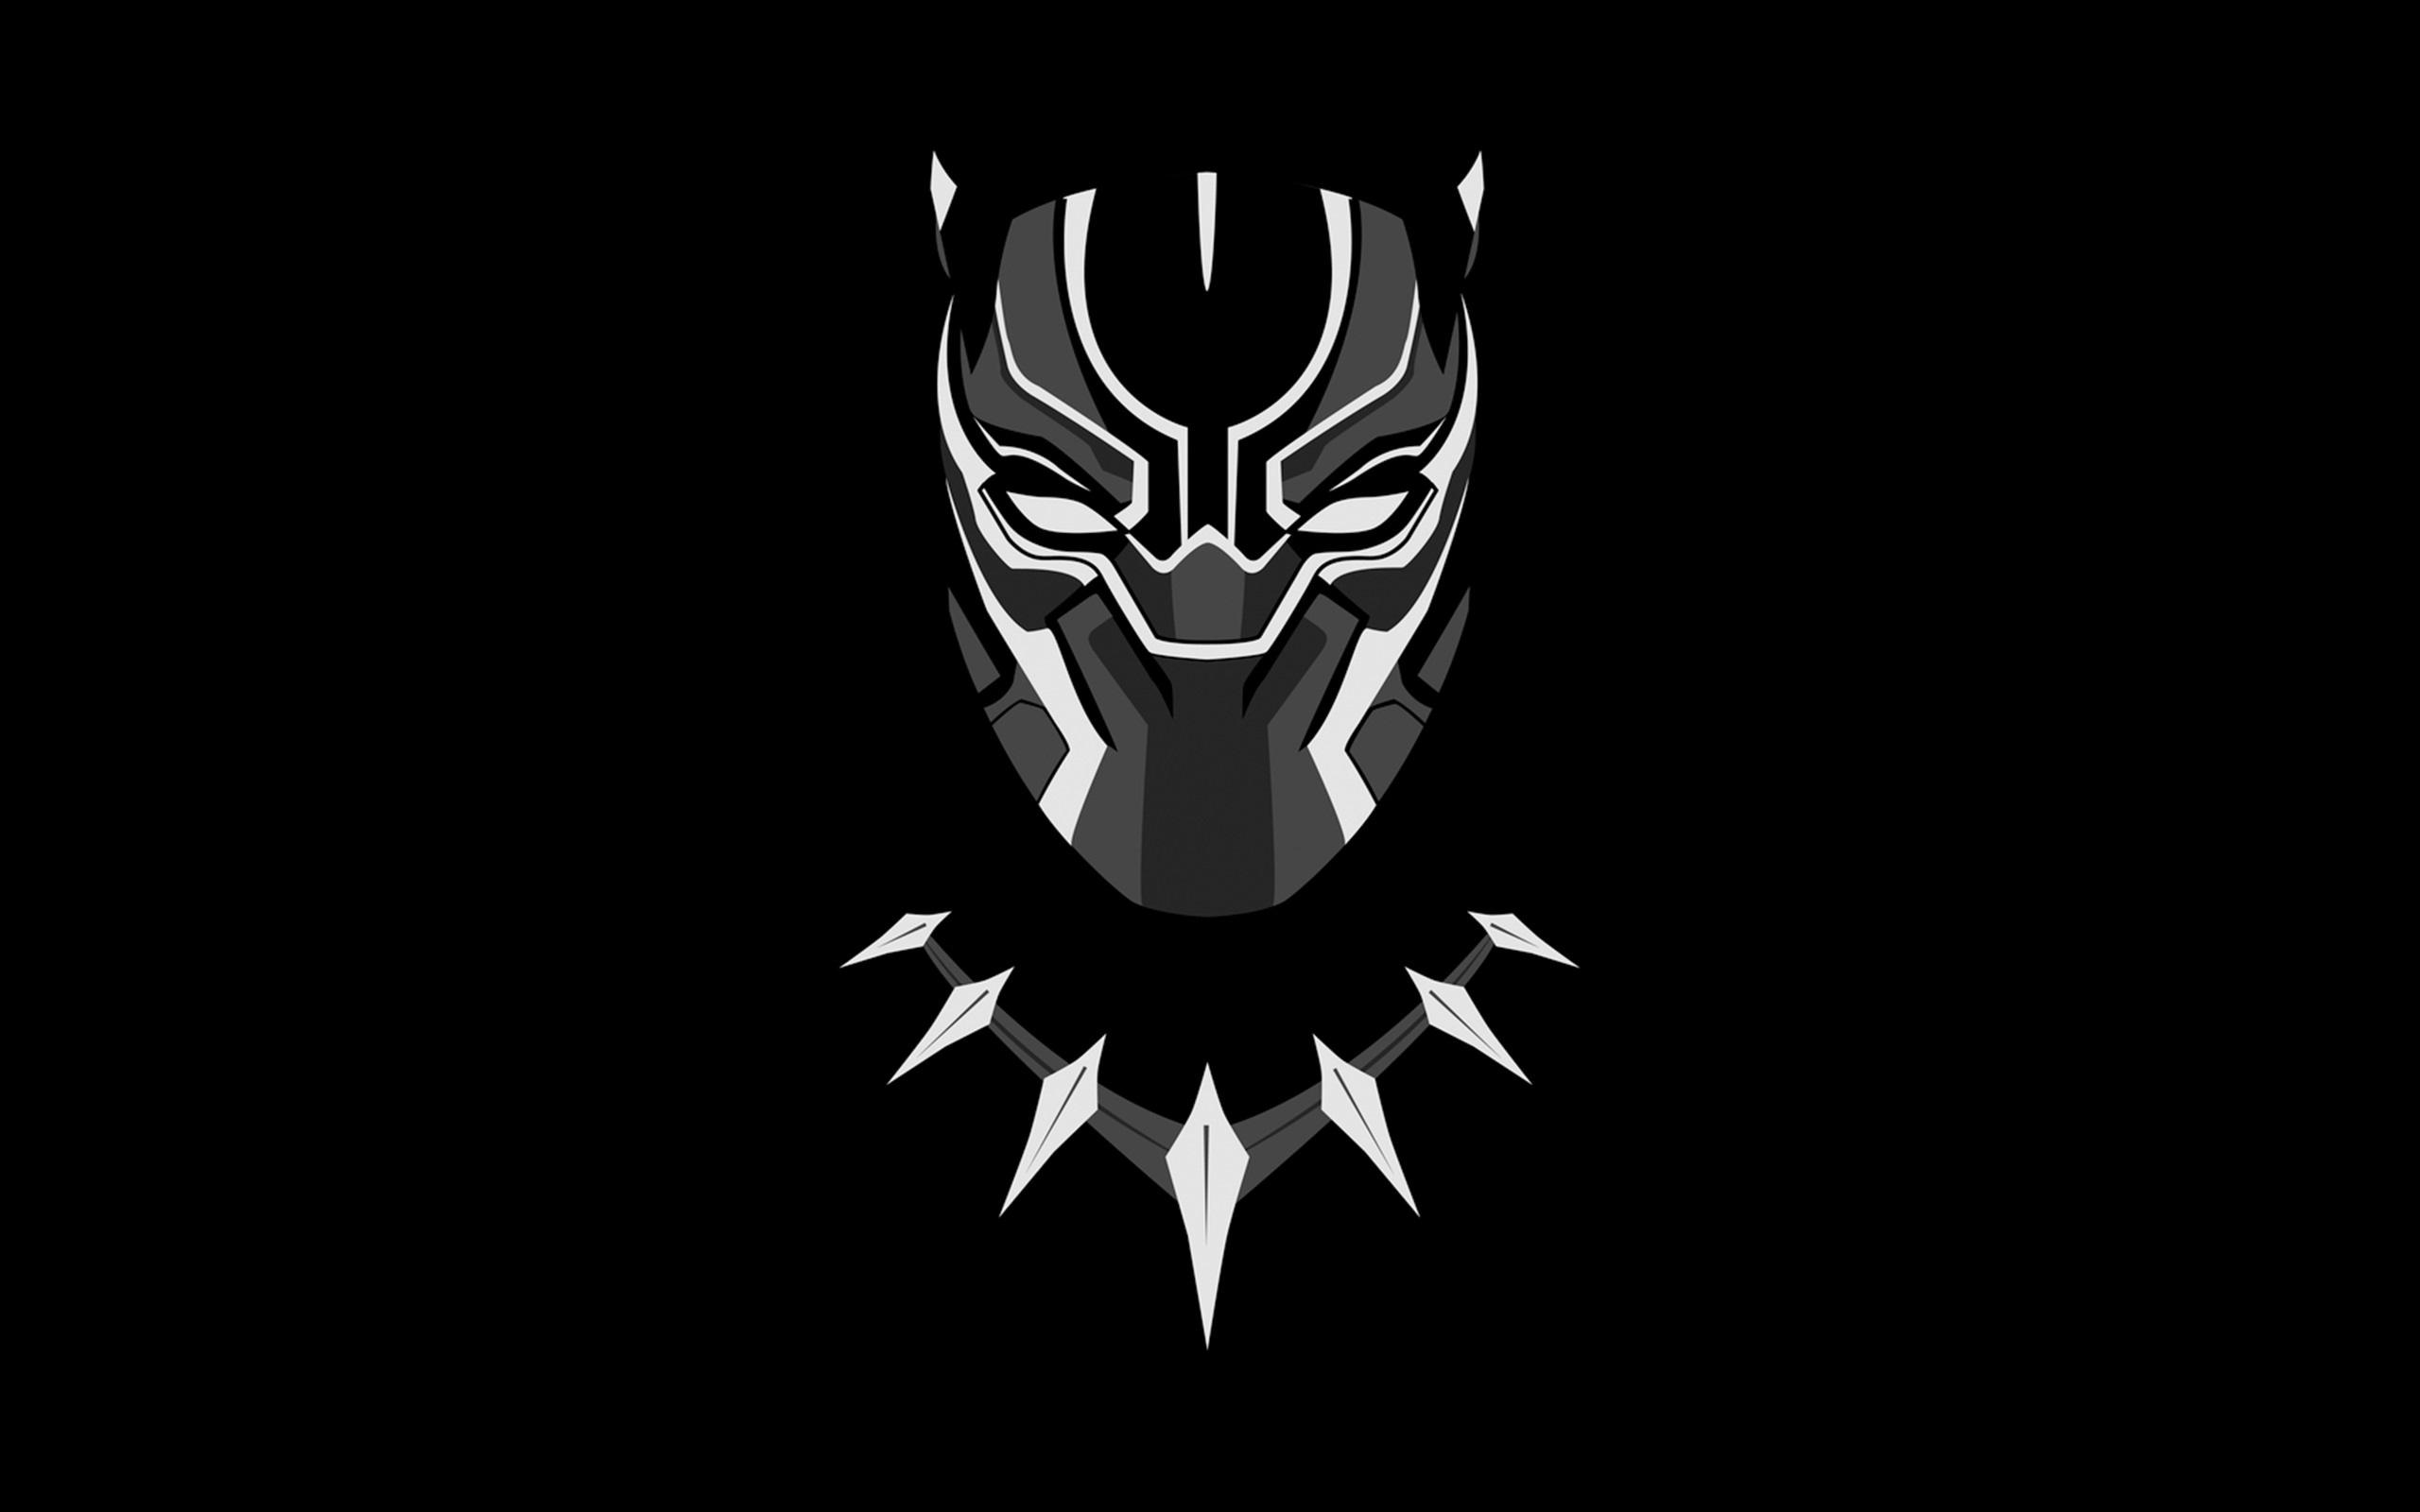 Black panther minimal artwork full hd 2k wallpaper download original voltagebd Gallery